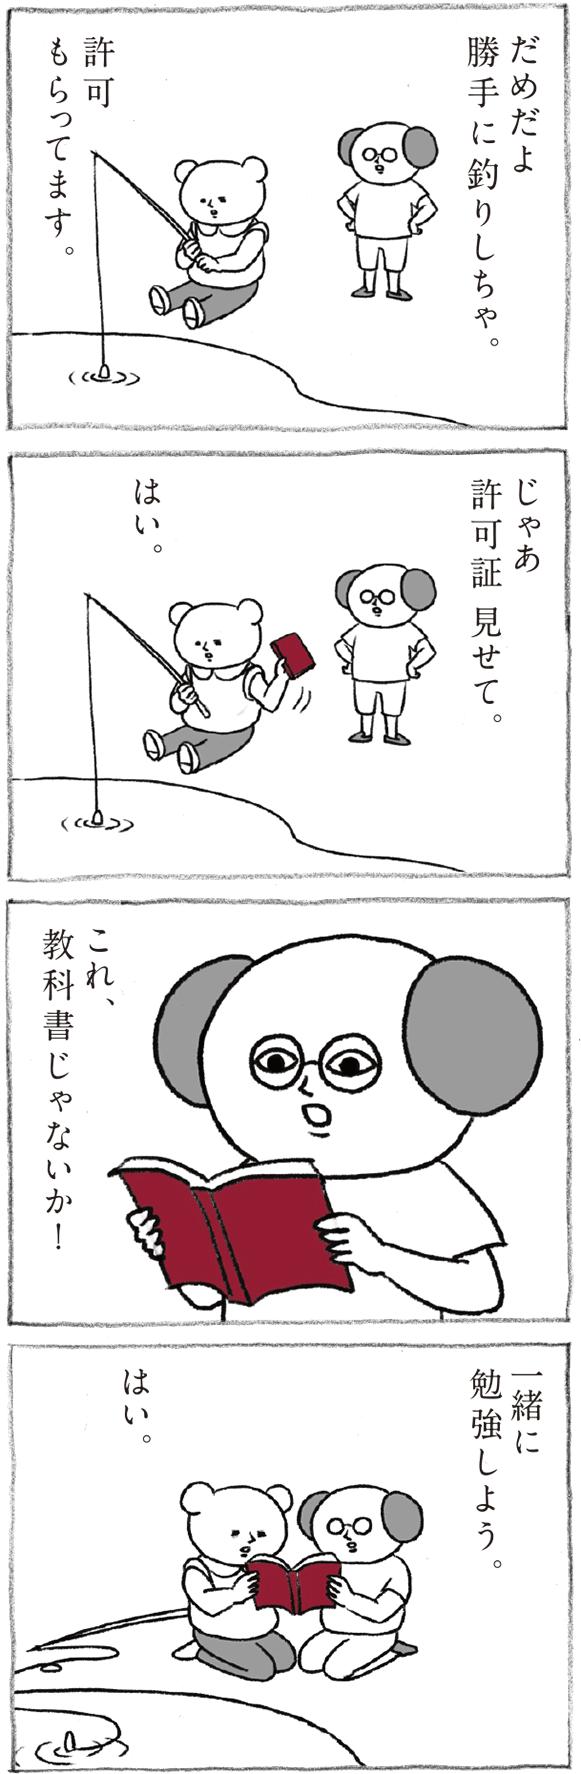 Hanako 1186号:おかわり自由